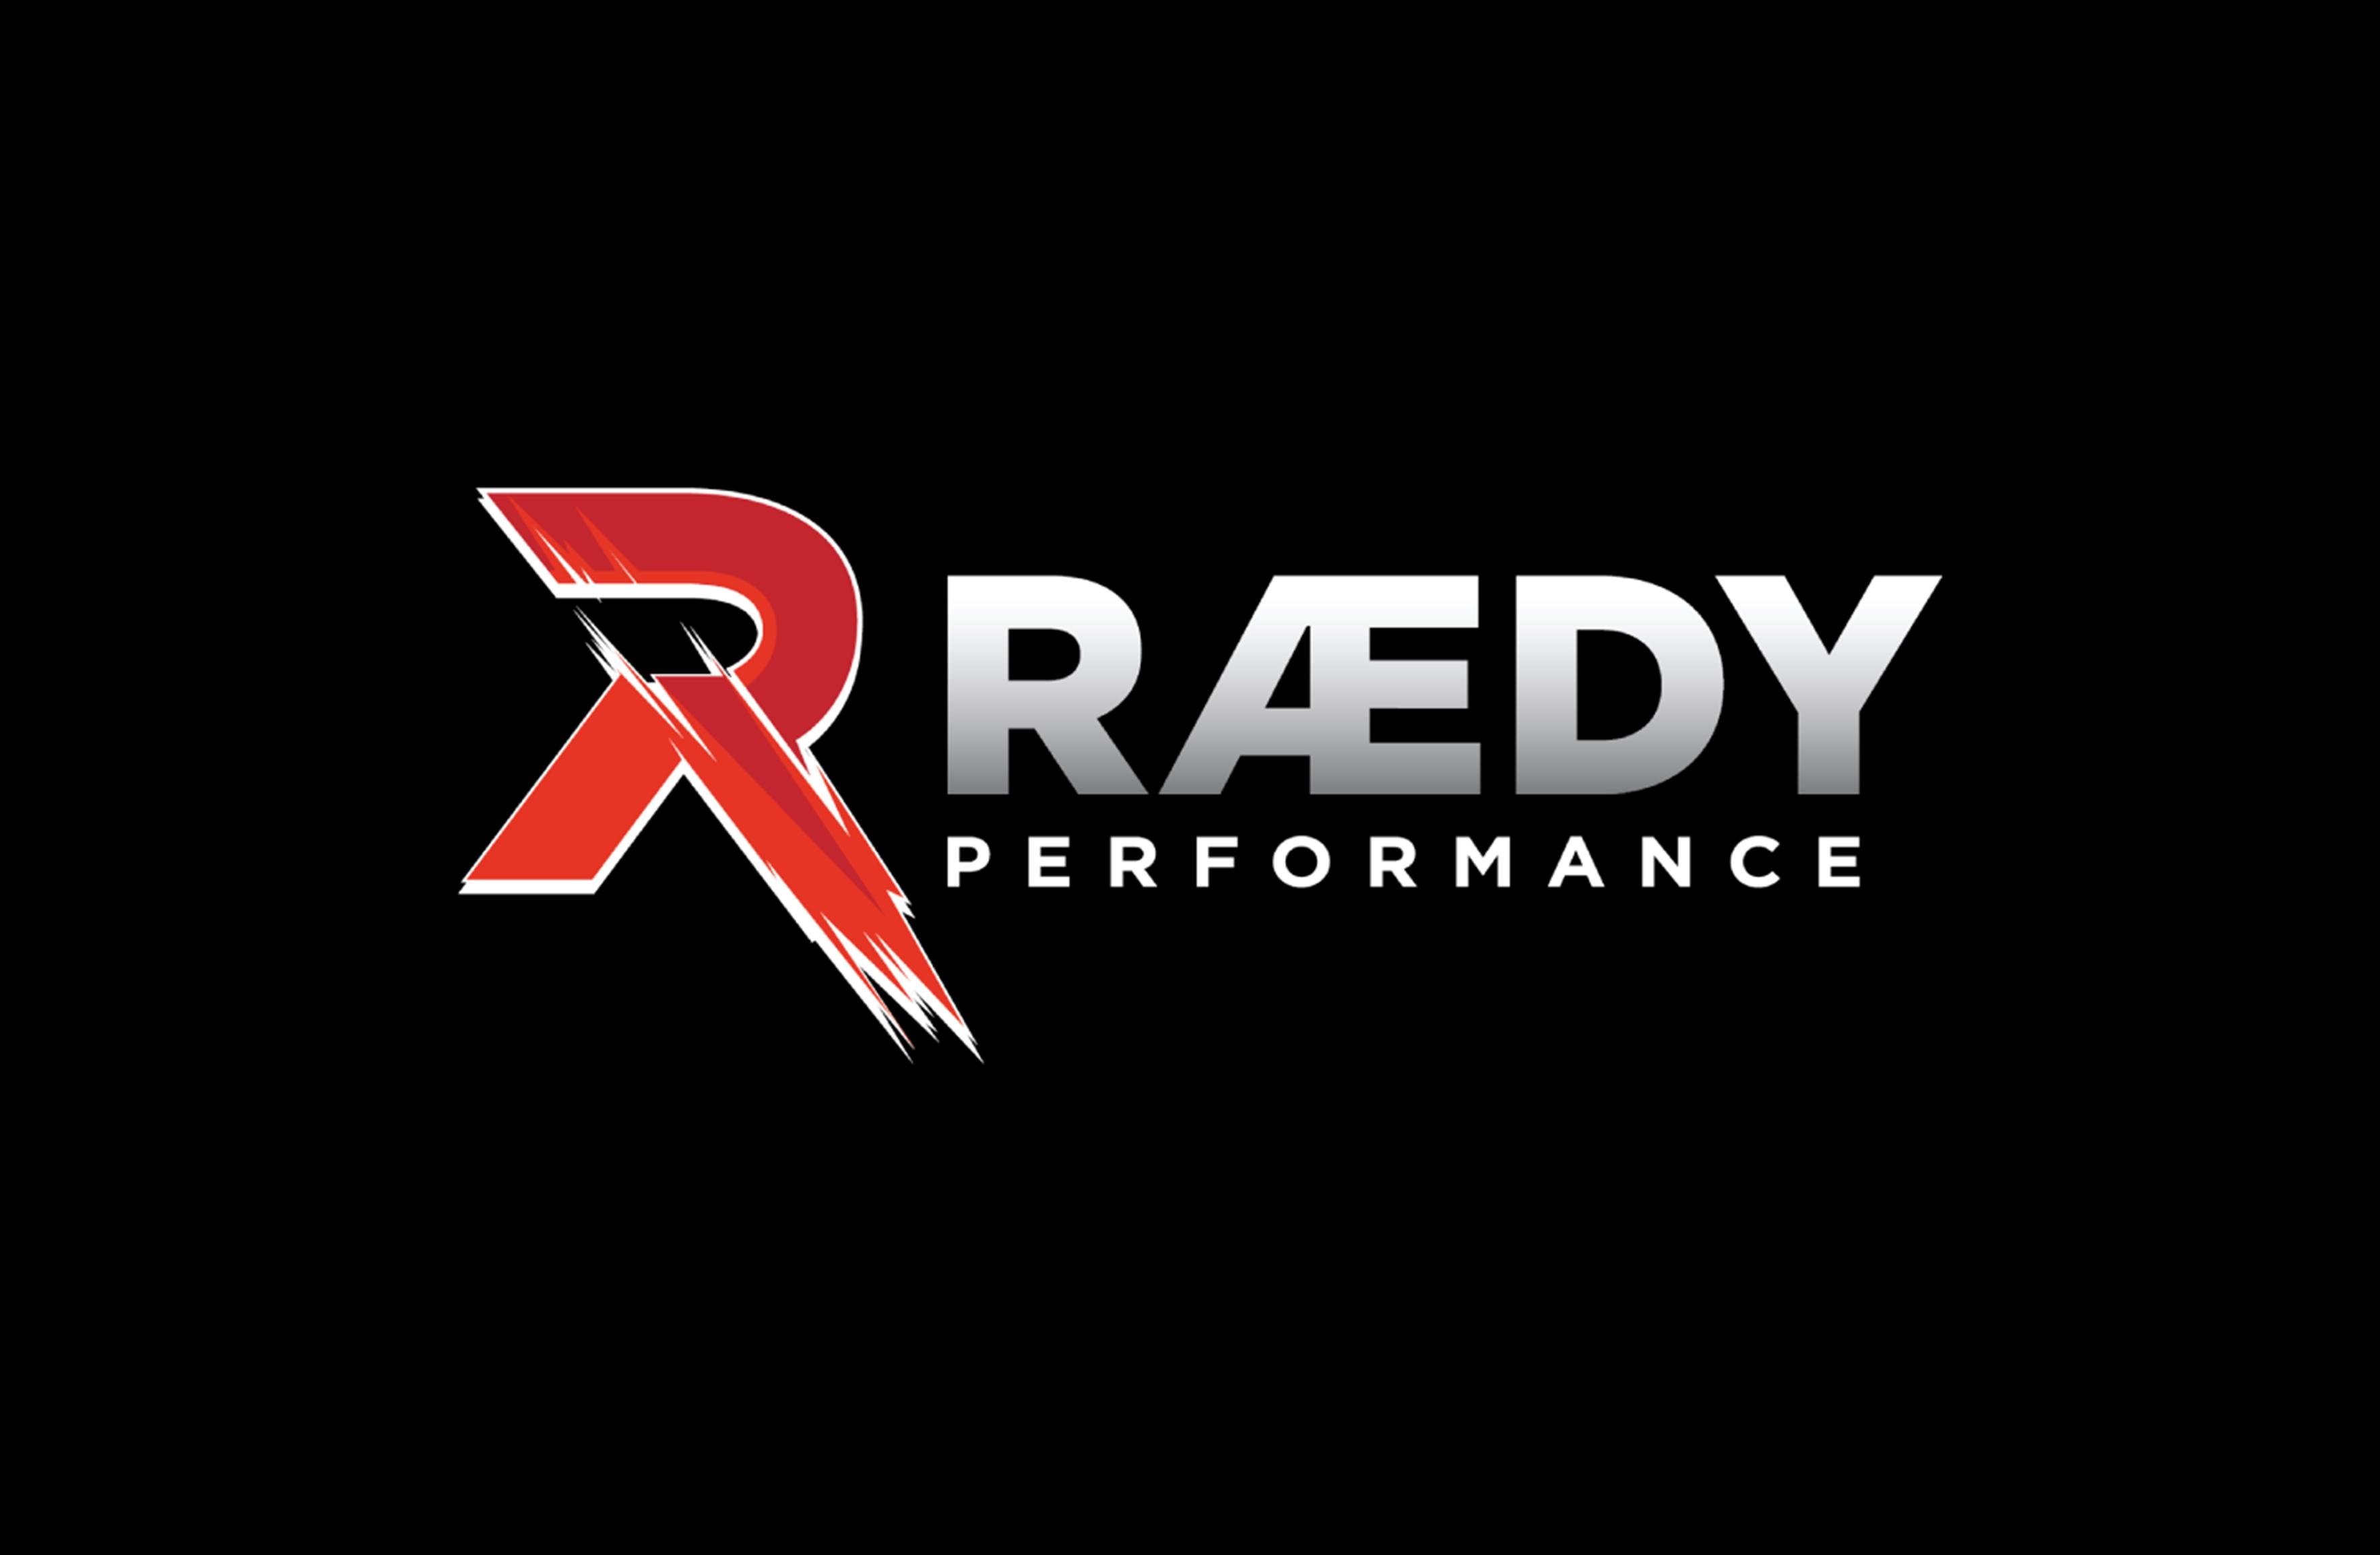 raedy performance image logo